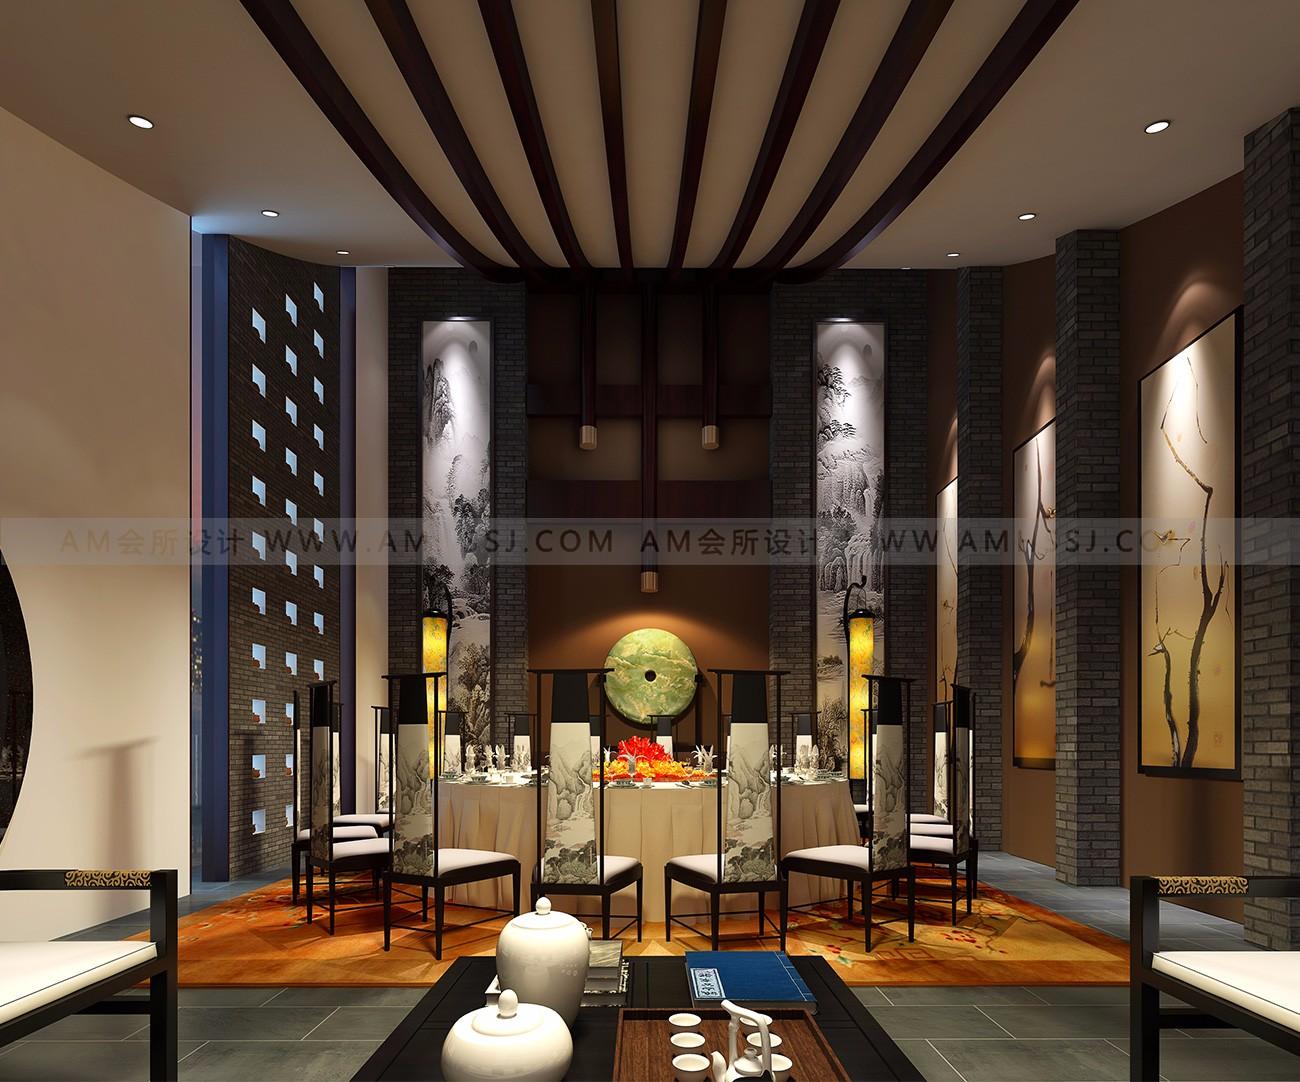 AM设计-名人汇餐饮休闲私人会所